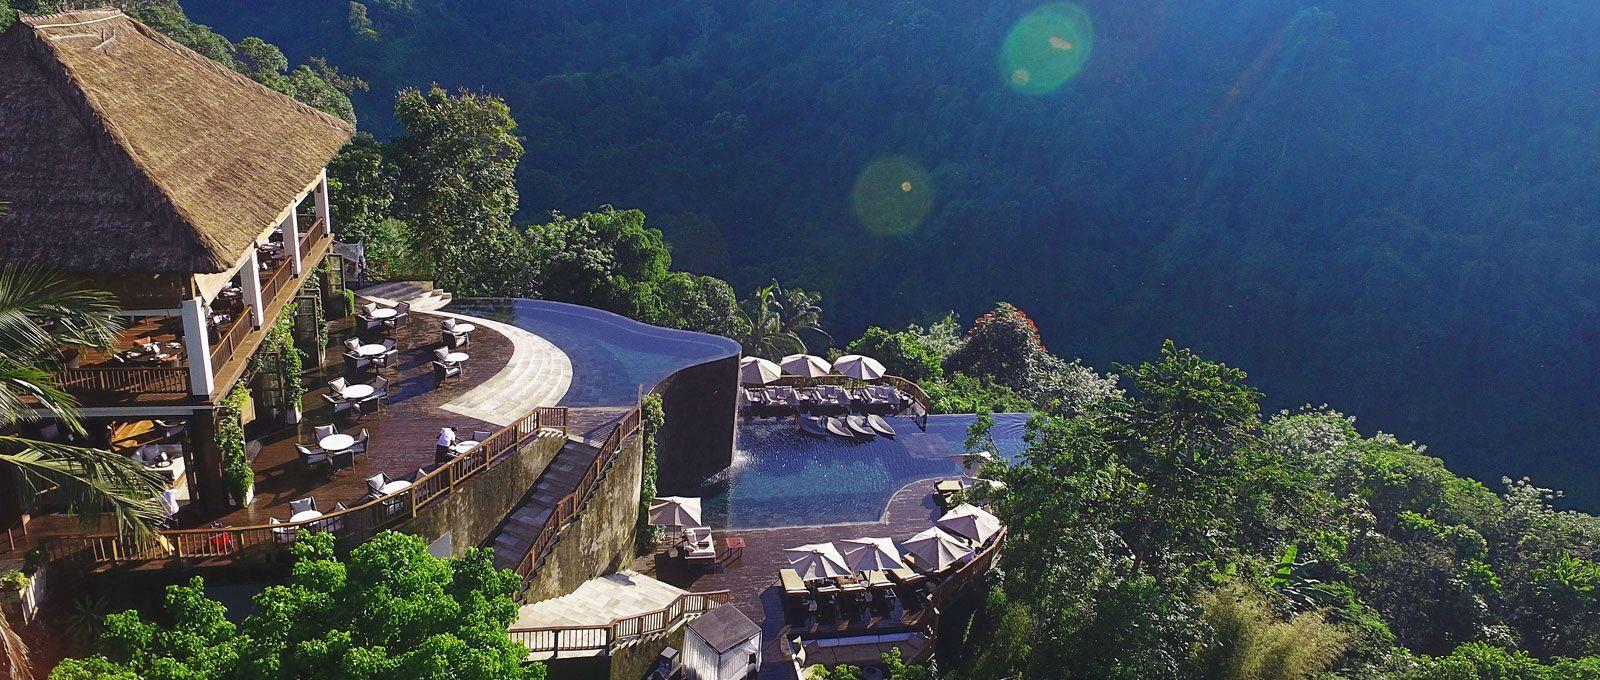 Official Site Hanging Gardens Bali Ubud 7 Star Hotel Resort Villas Spa Hotel Swimming Pool Jungle Resort Romantic Resorts